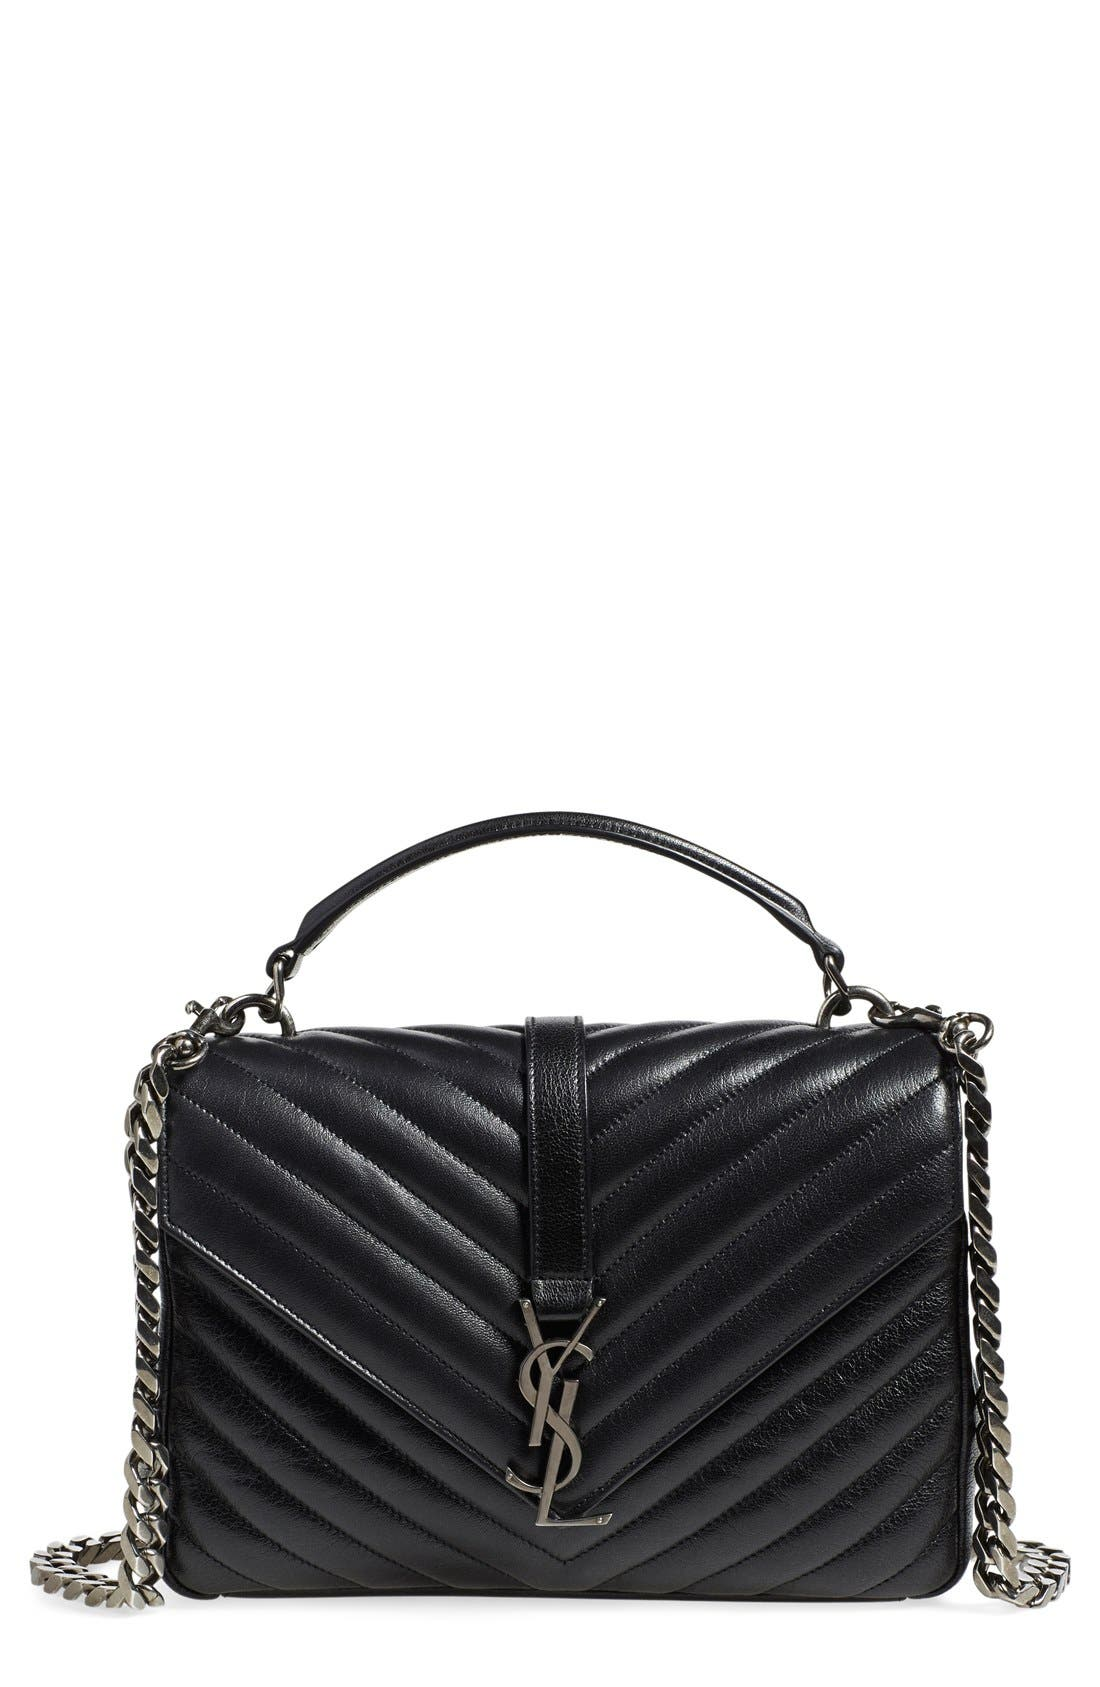 Main Image - Saint Laurent 'Medium Monogram' Quilted Leather Shoulder Bag